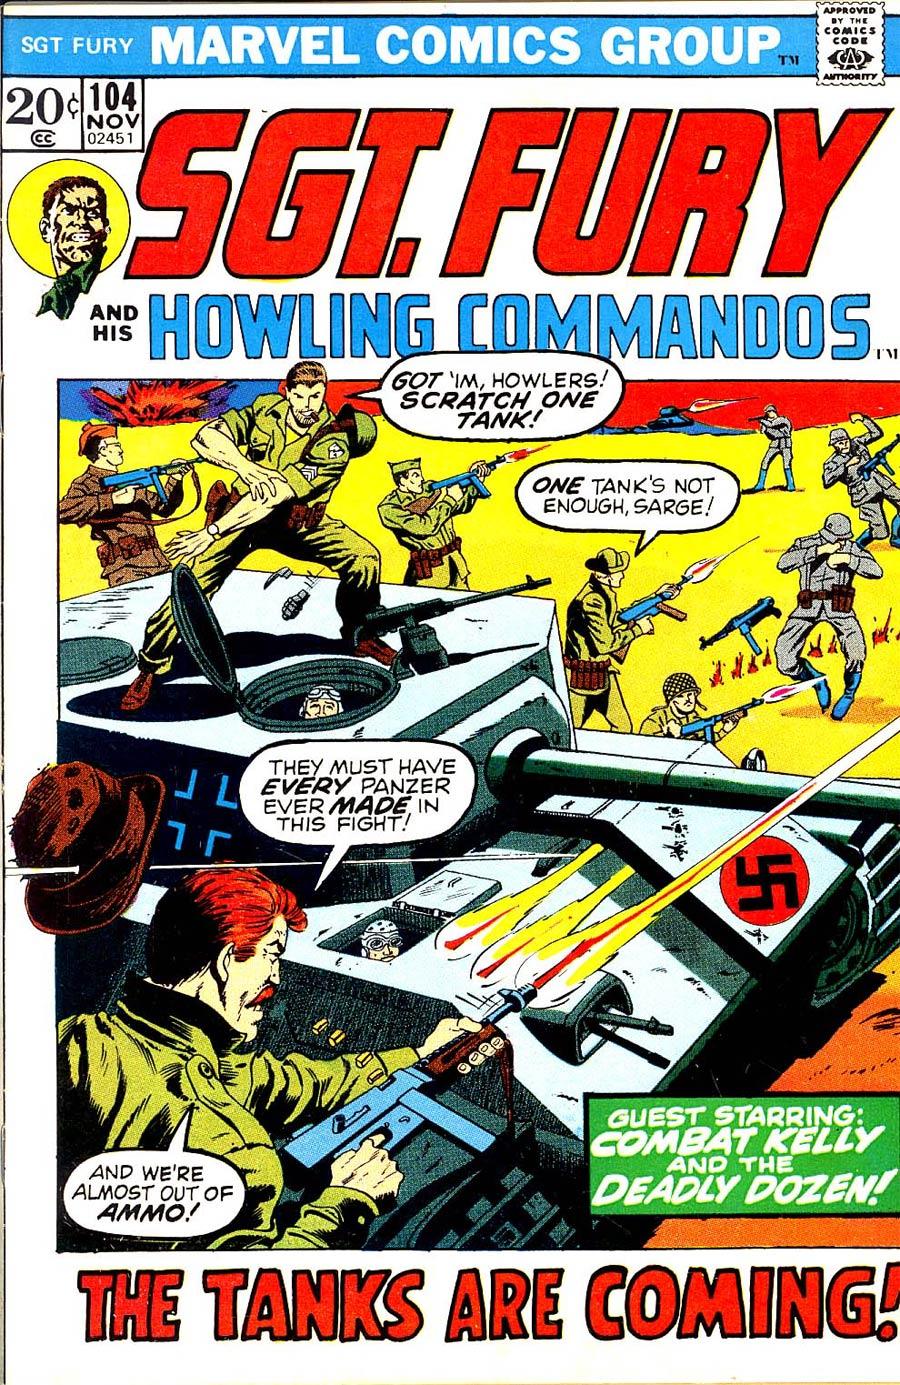 Sgt. Fury & His Howling Commandos #104